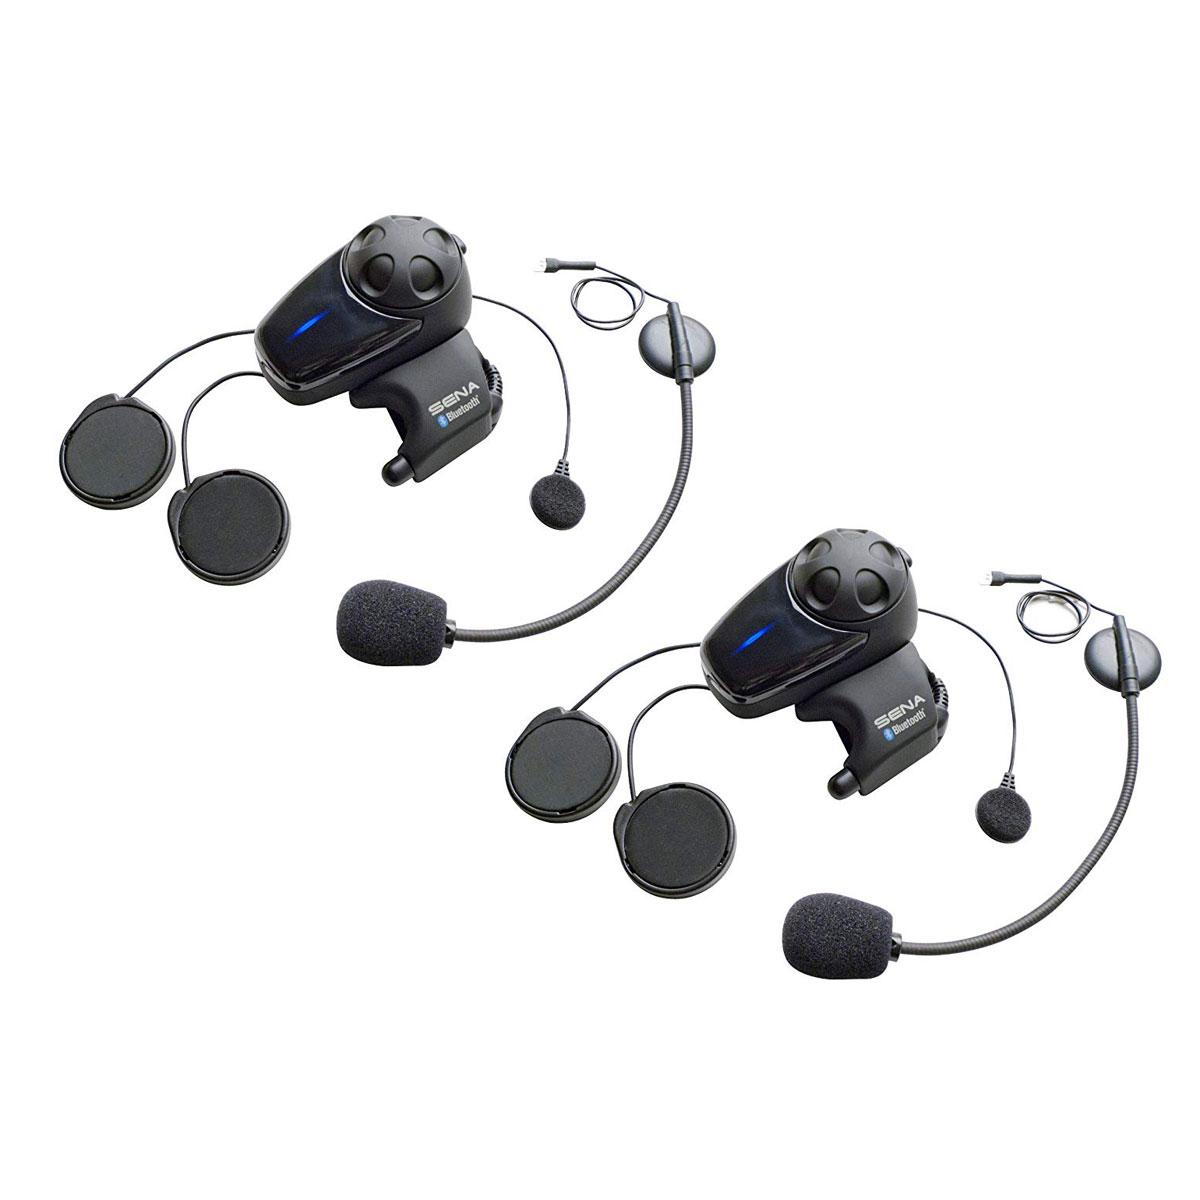 3de9fbdd32a Sena Technologies SMH10 MC Bluetooth Headset/Intercom with Universal Mic  Kit Dual Pack